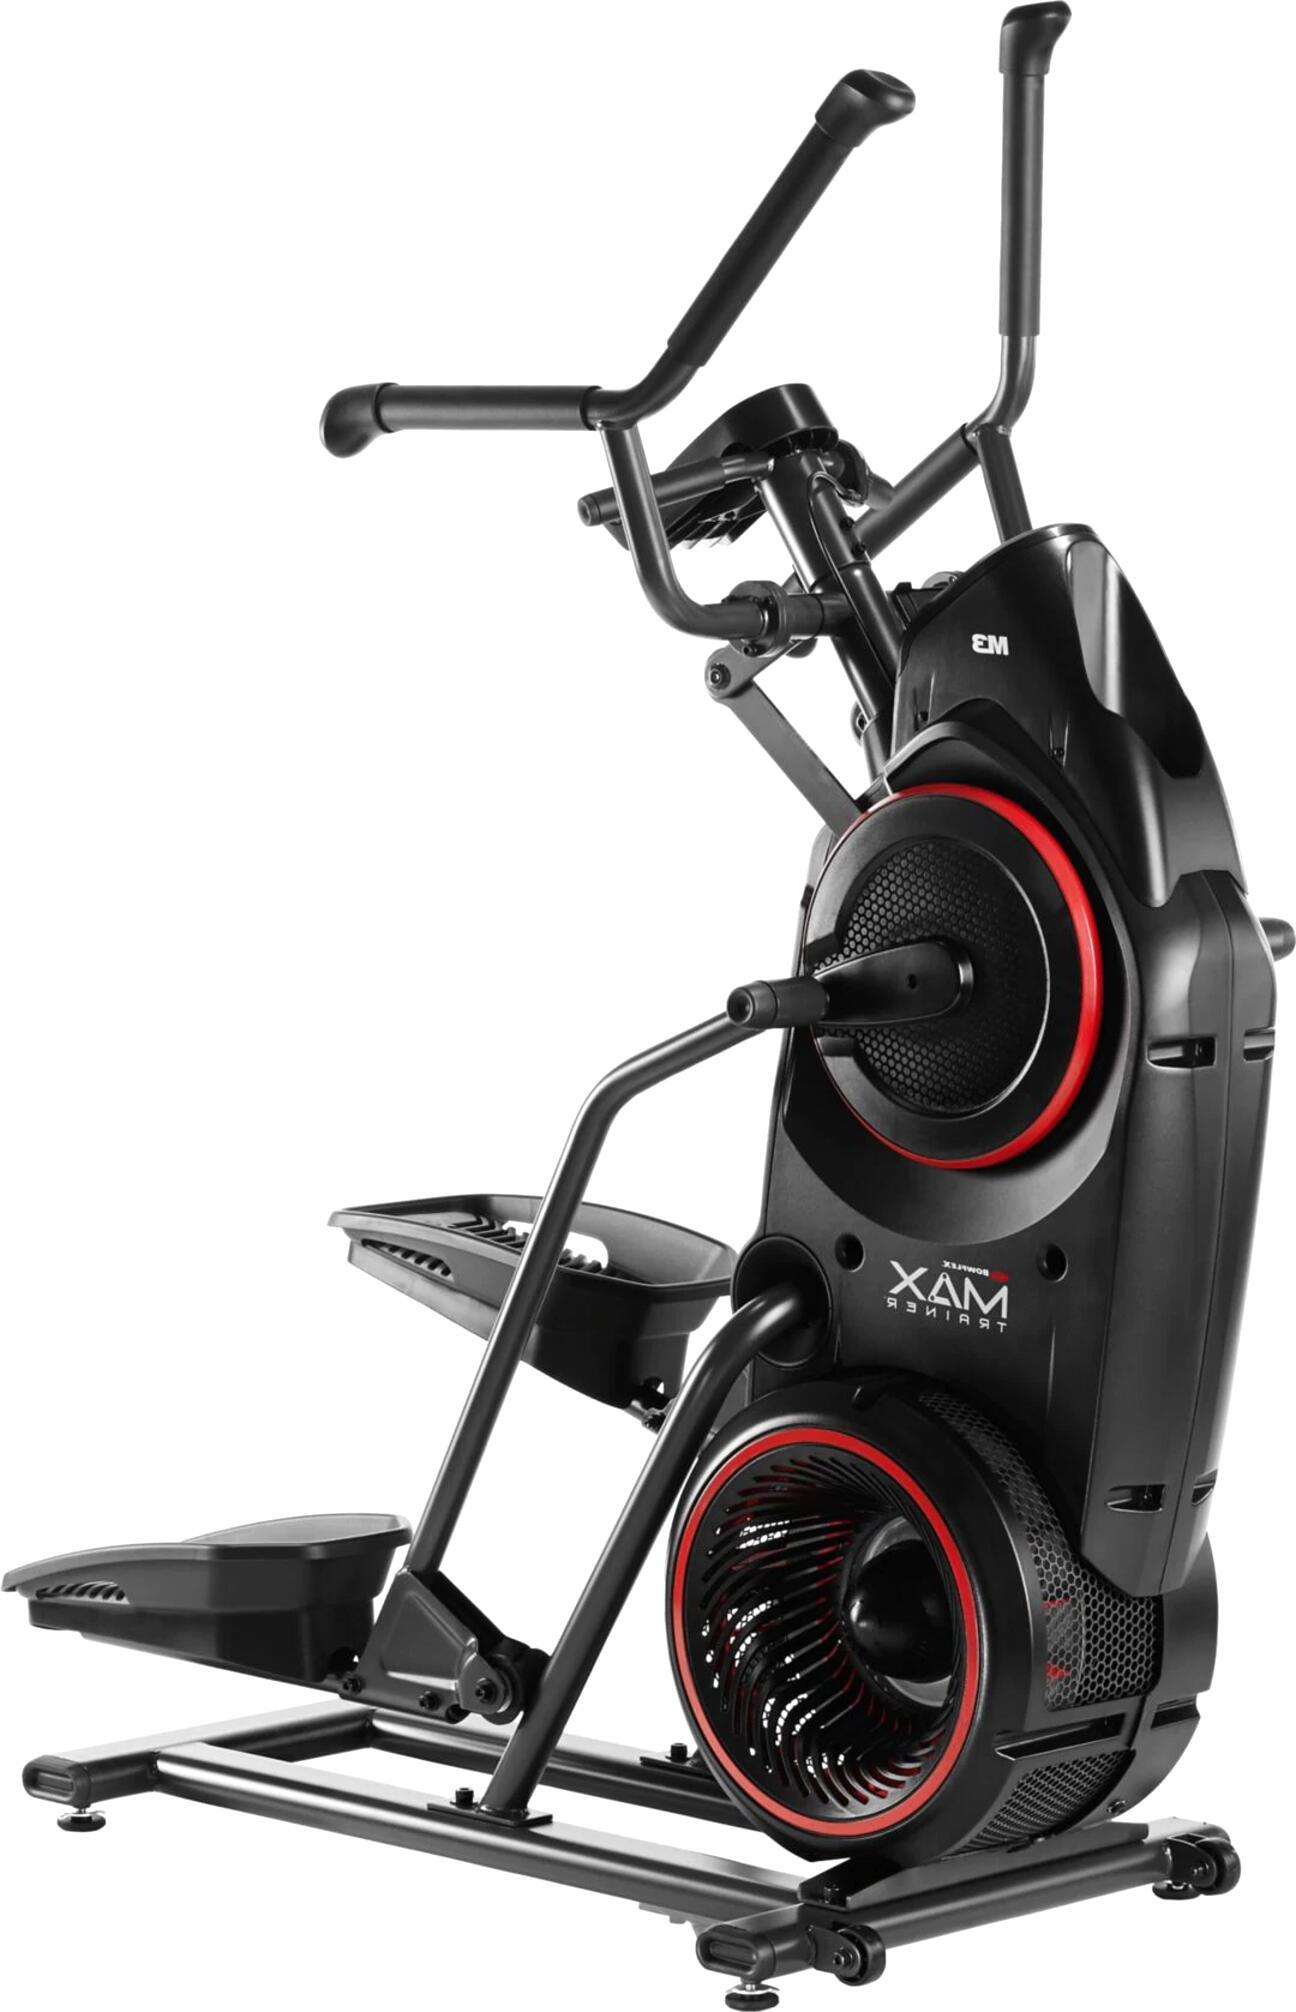 bowflex max trainer for sale